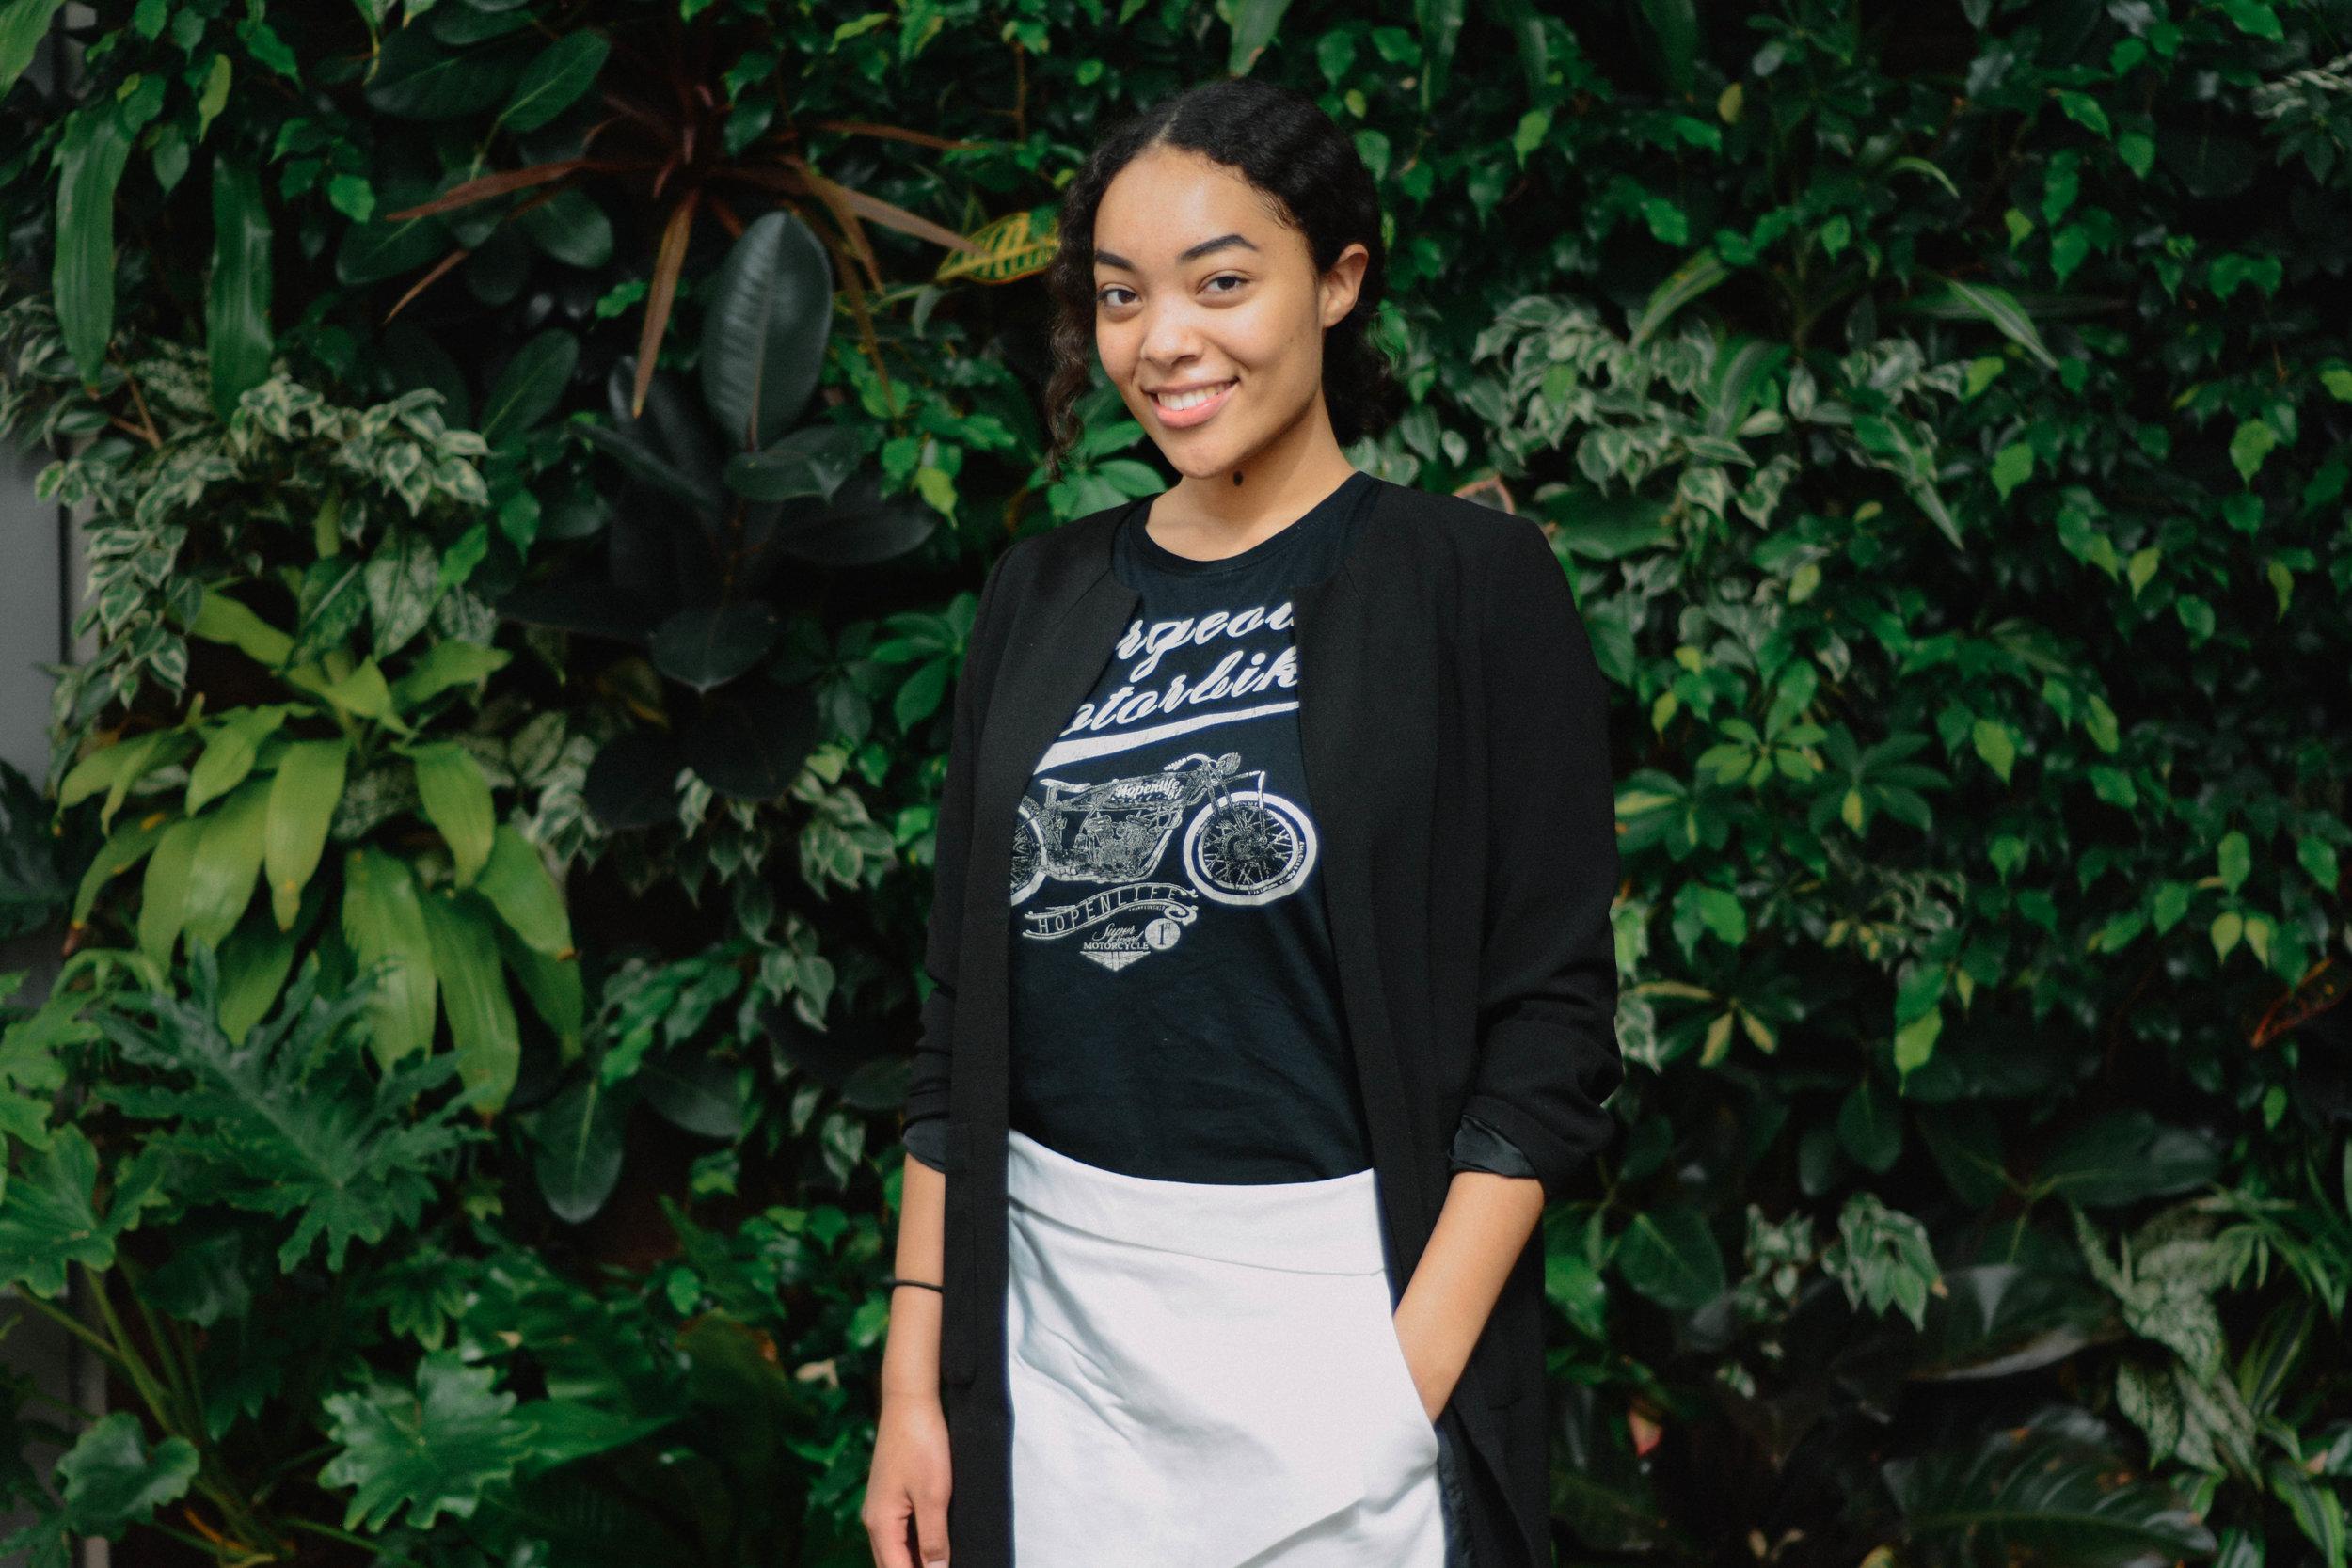 ROGUE - A magazine to address socioeconomic disparities in the fashion industry.KAI MASON